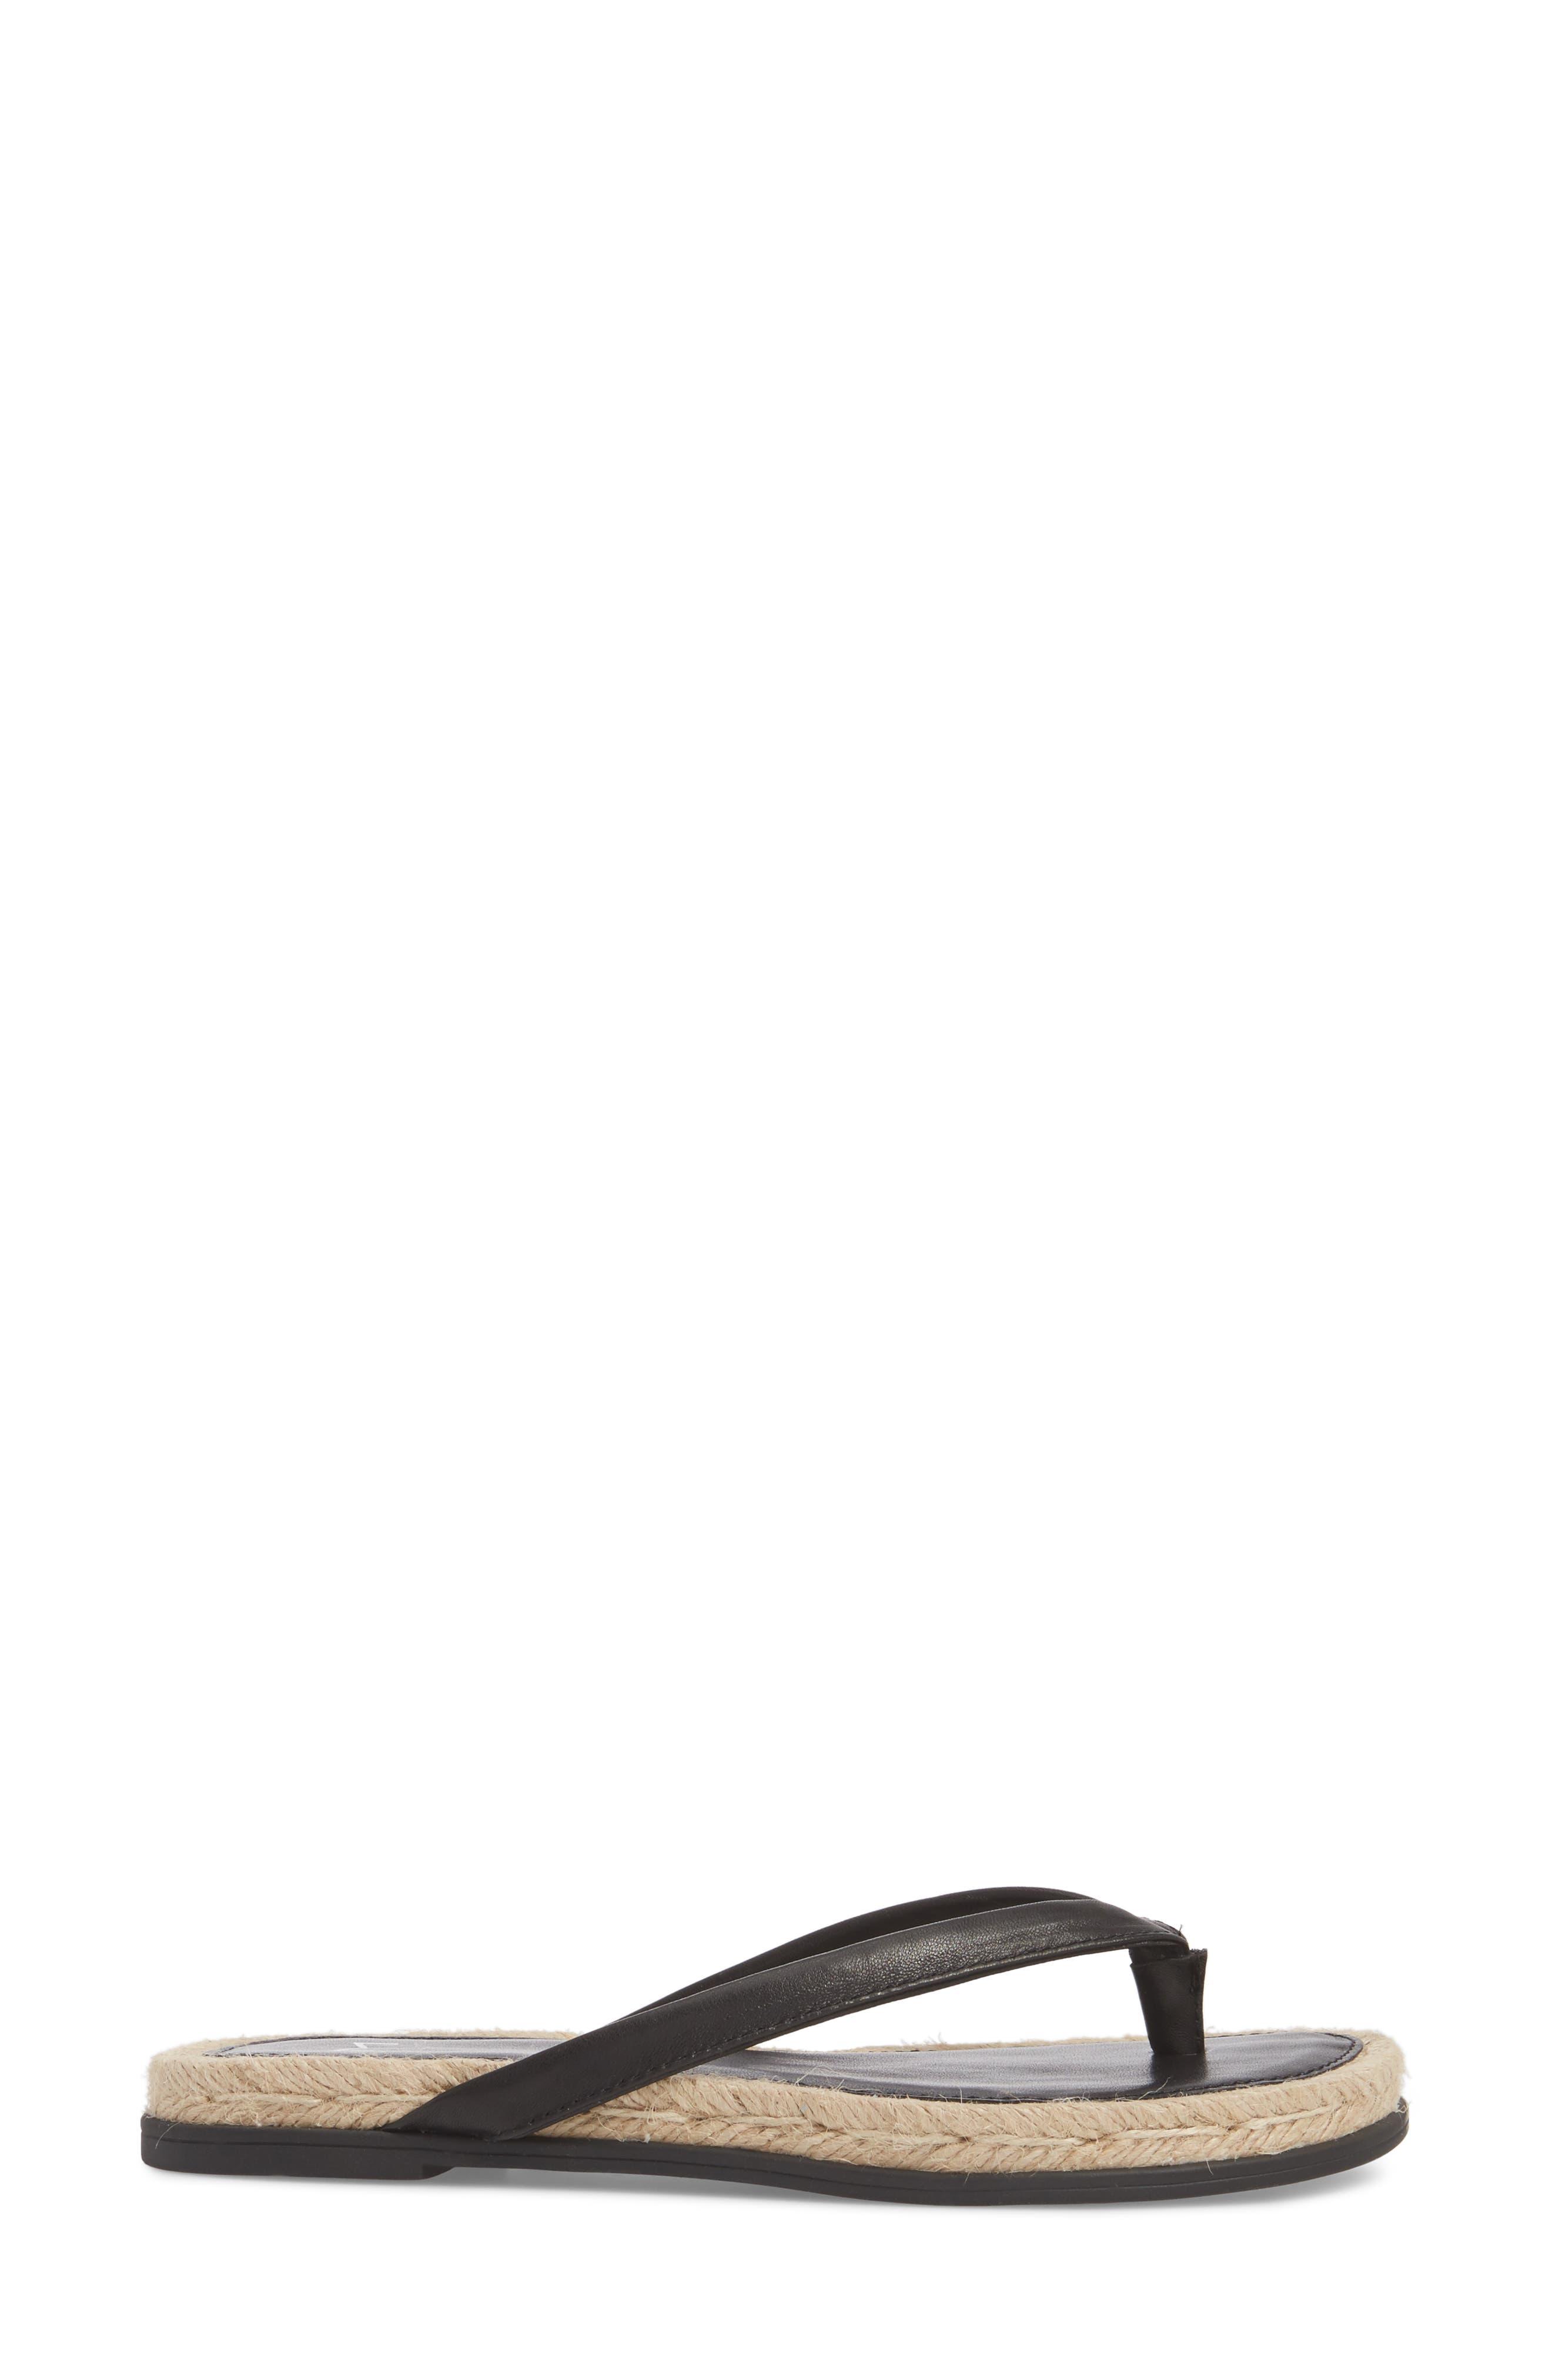 Utah Espadrille Sandal,                             Alternate thumbnail 7, color,